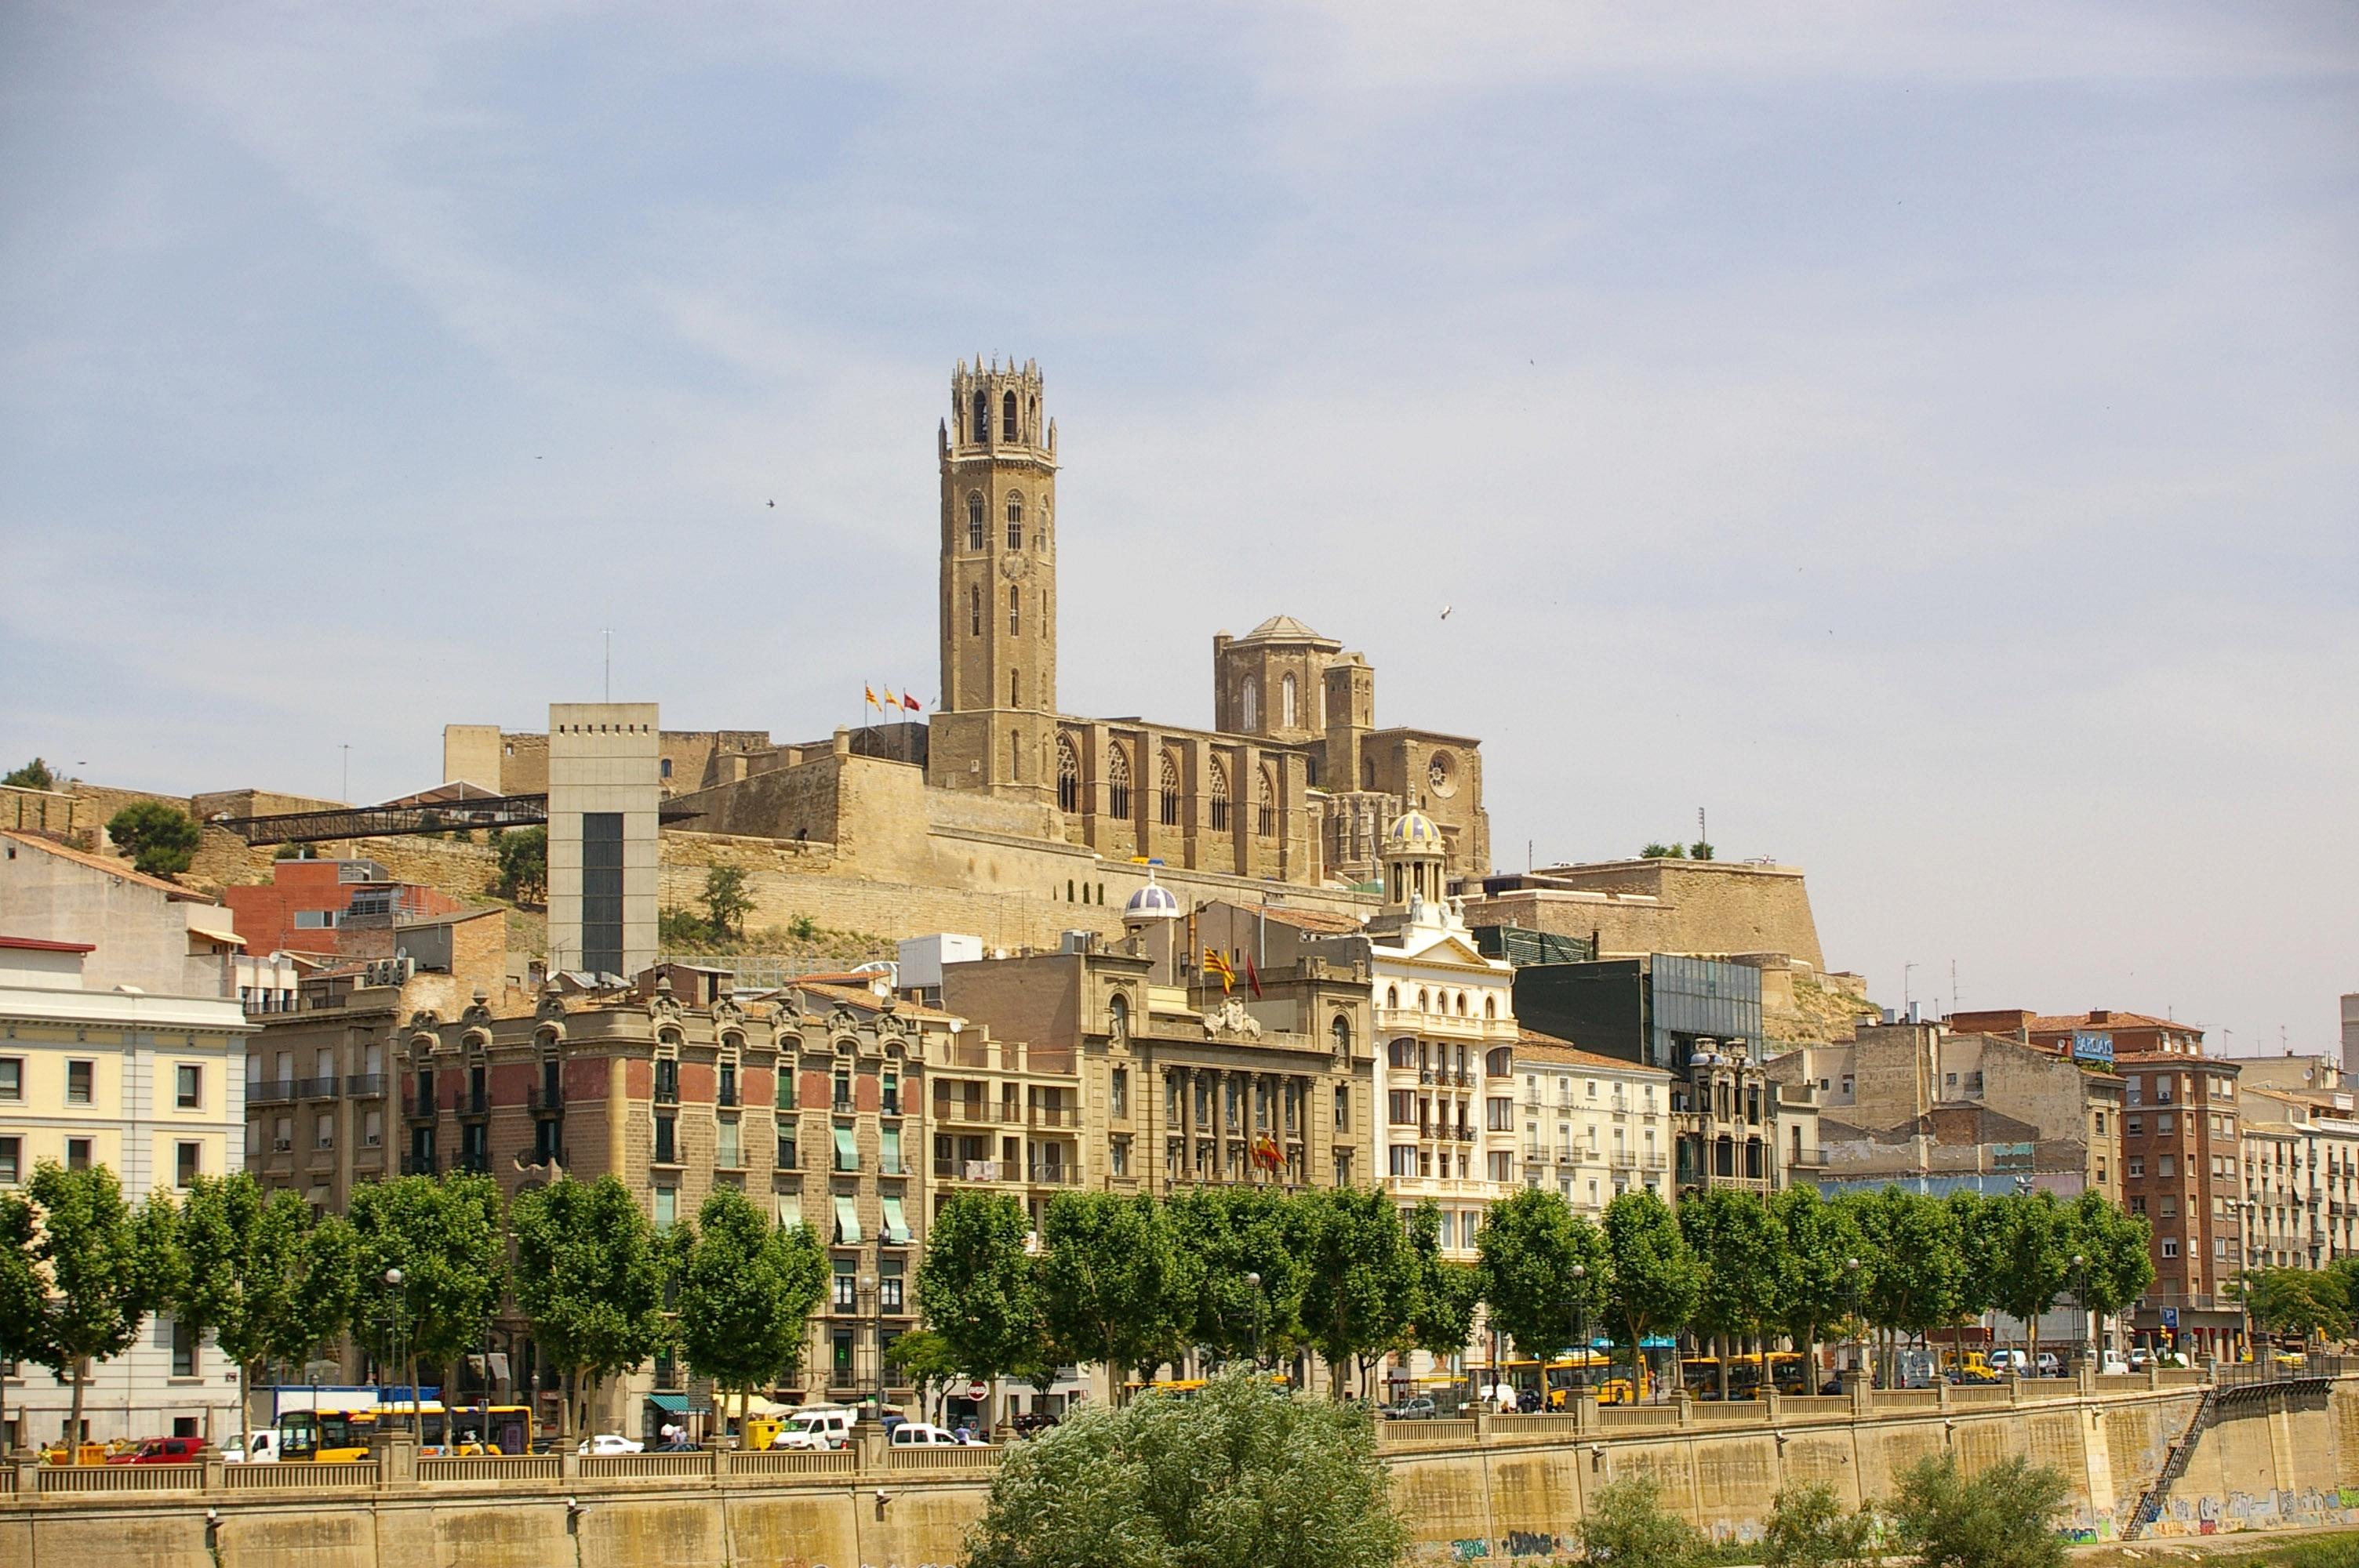 Lleida Spain  city pictures gallery : Archivo:Lleida La Seu Vella des de Cappont Wikipedia, la ...